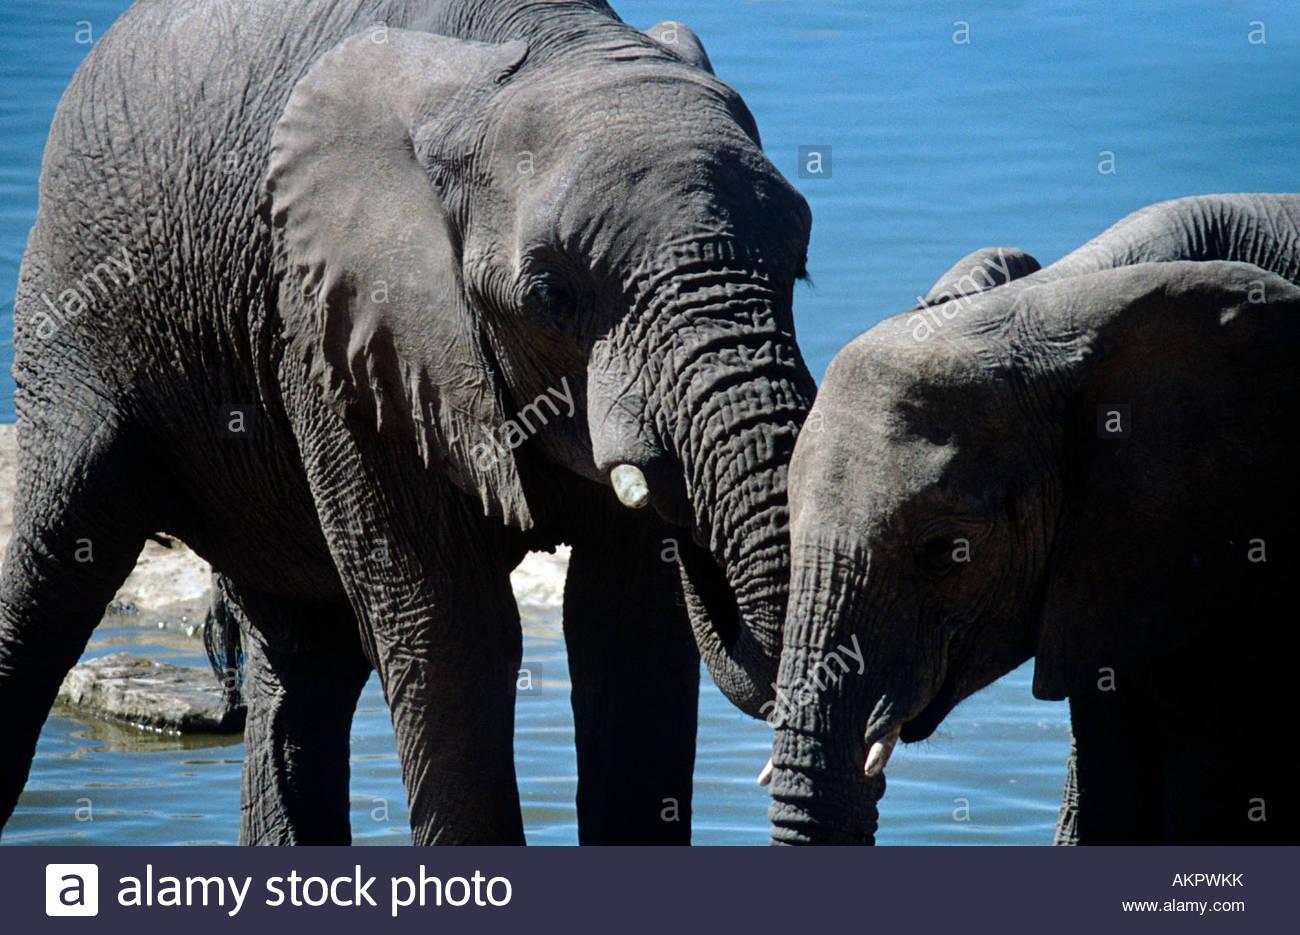 Elephant and calf - Stock Image